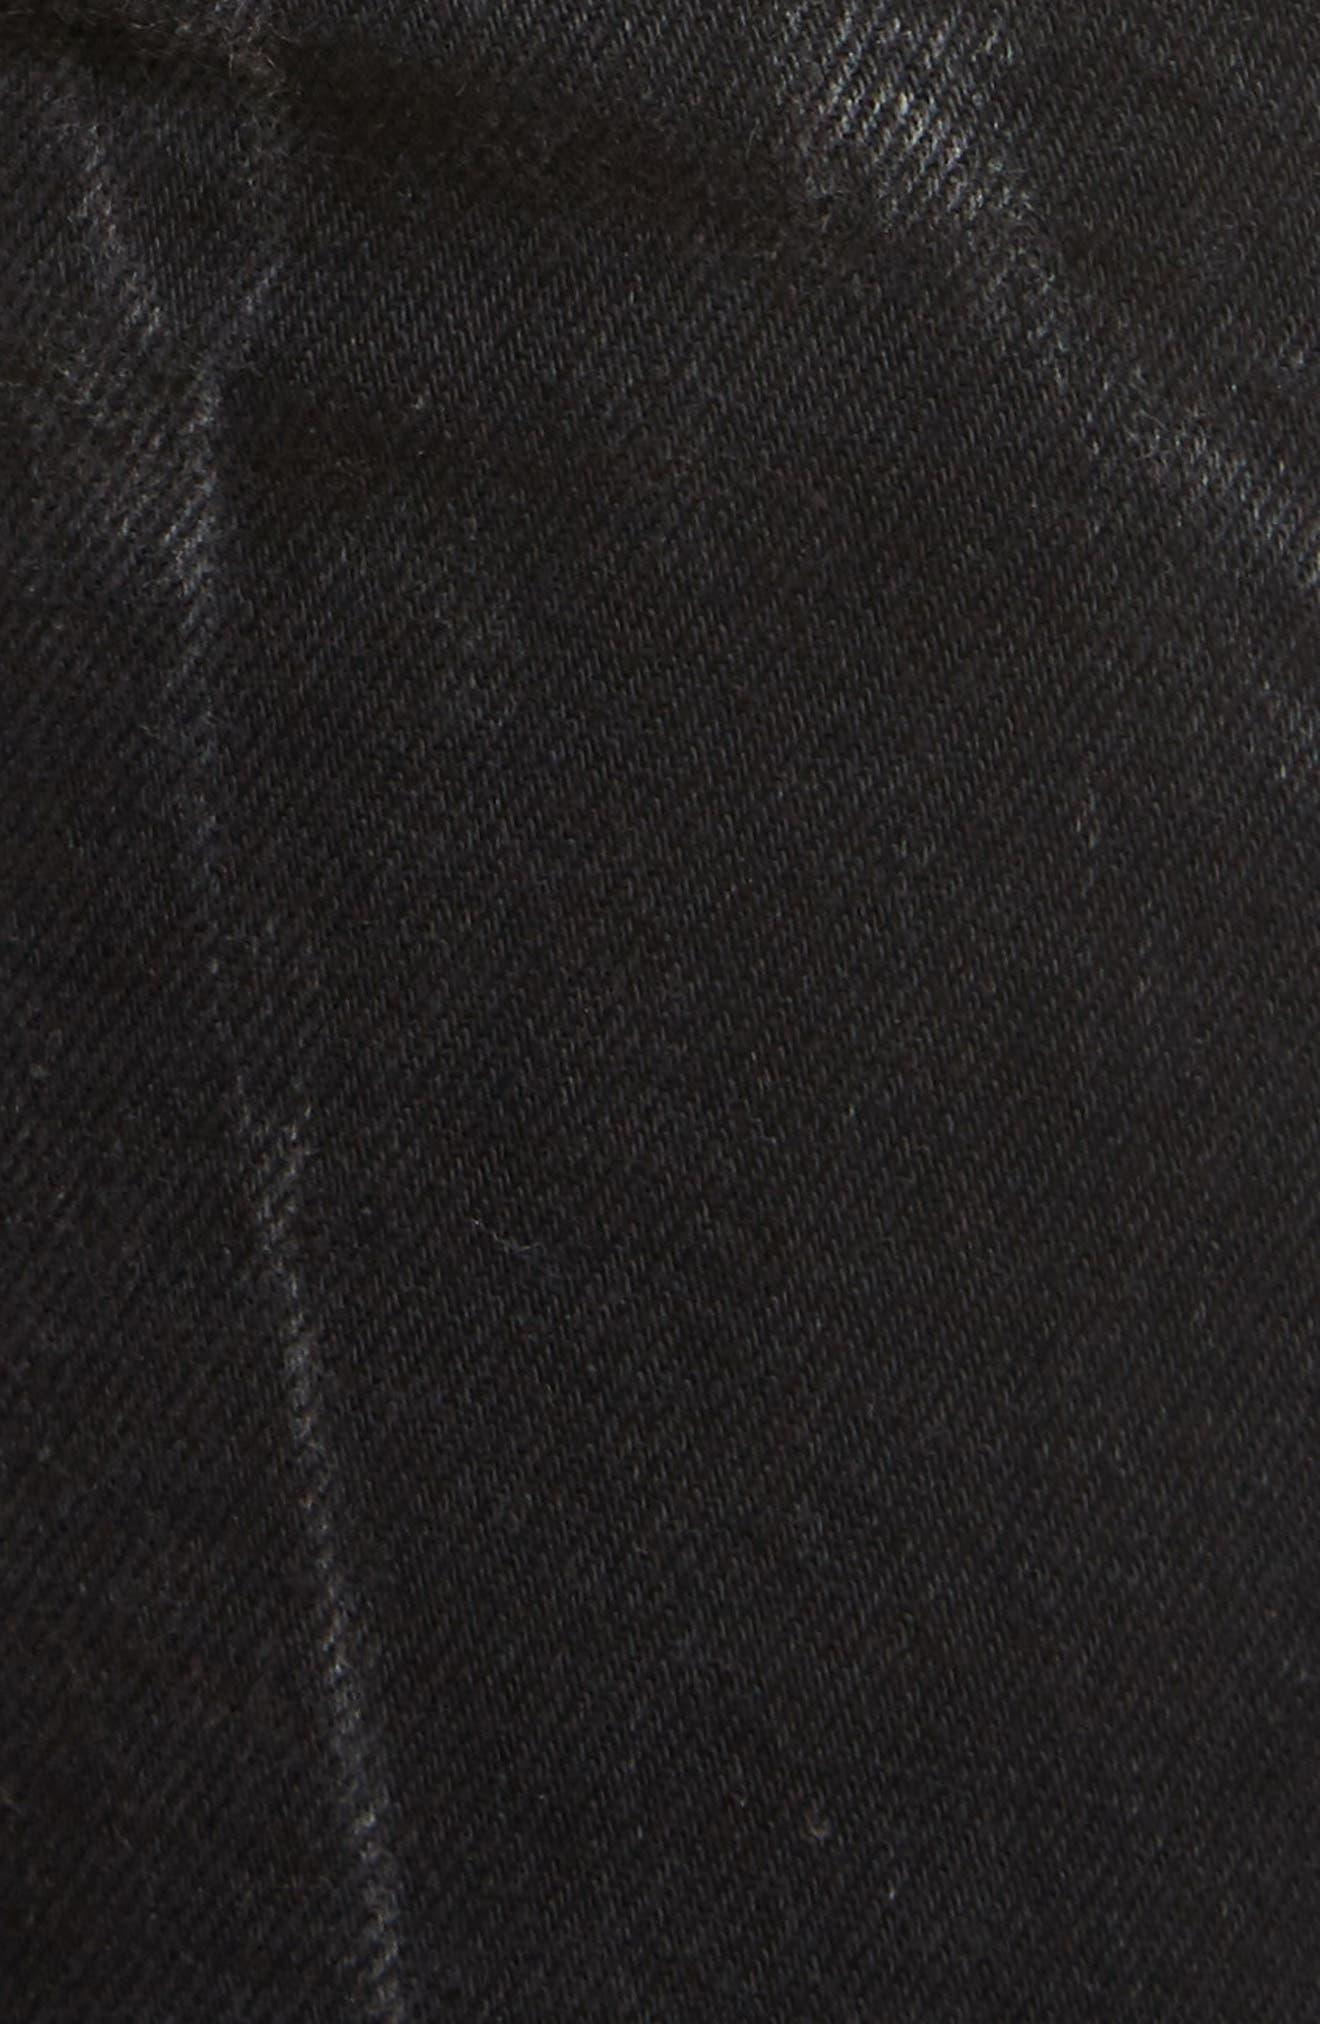 Slim Fit Vintage Wash Jeans,                             Alternate thumbnail 5, color,                             002